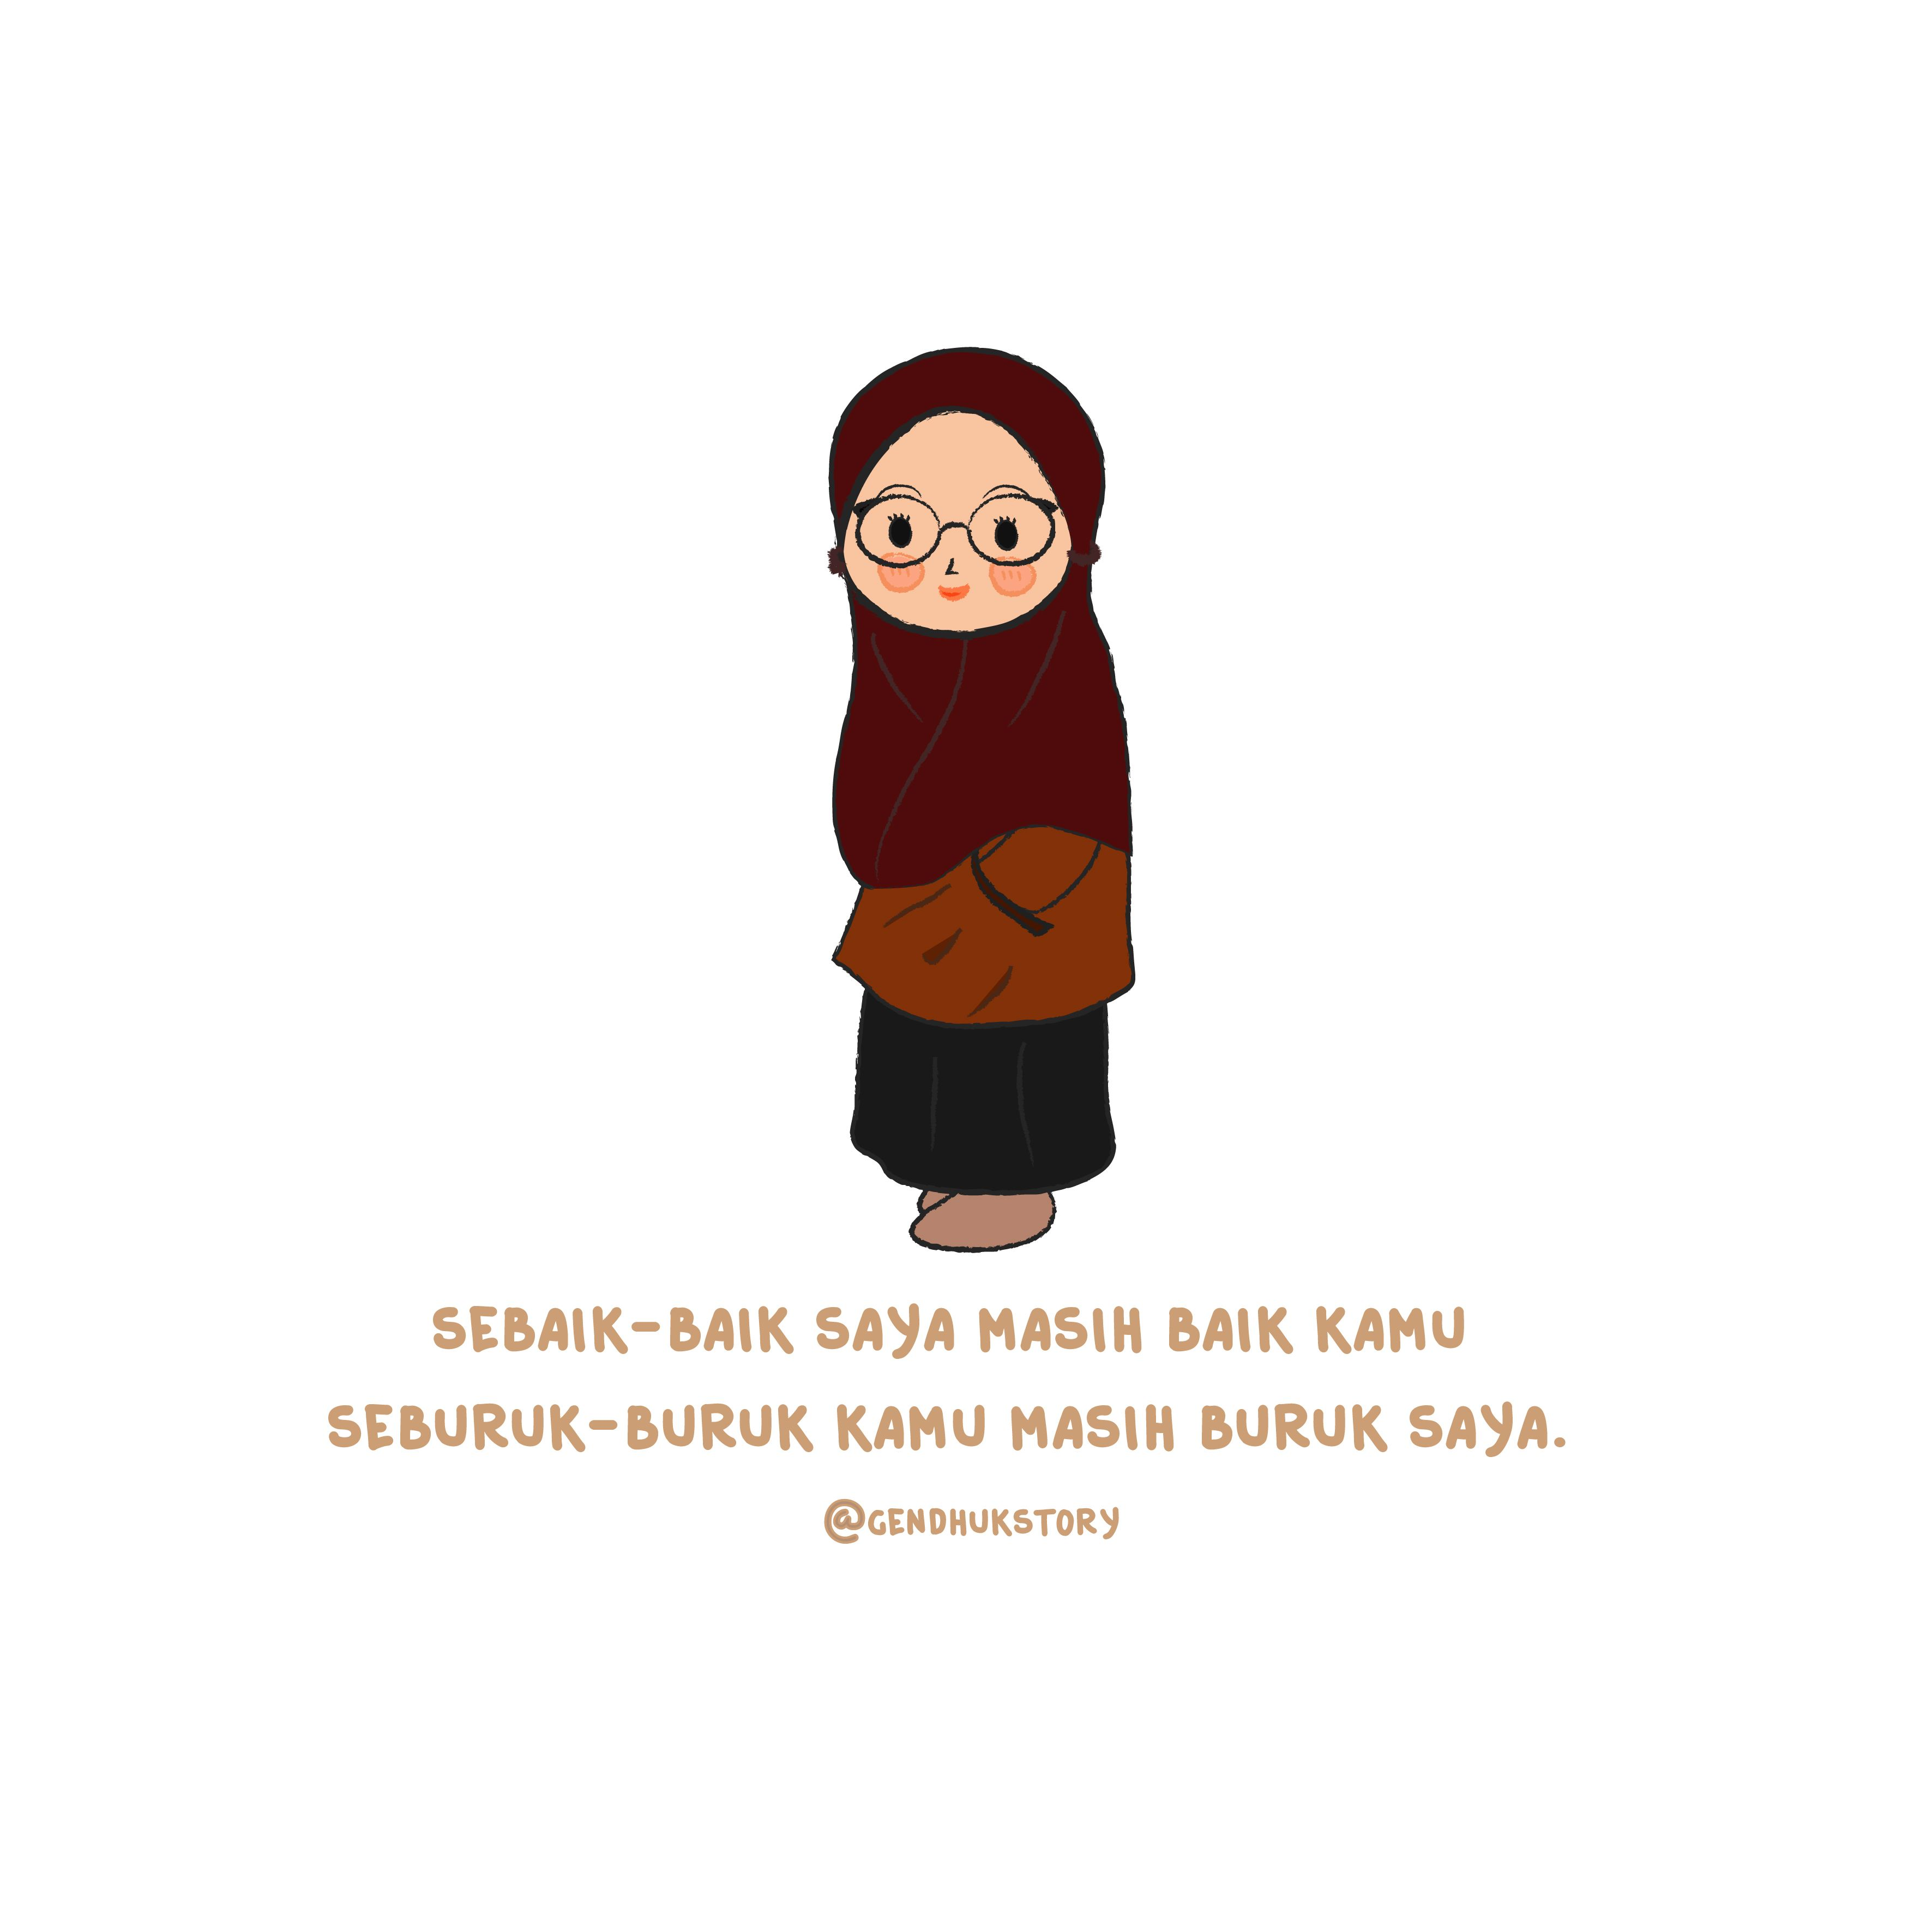 Pingl Par Dita Abidah Sur Muslimah Gendhukstory Pinterest